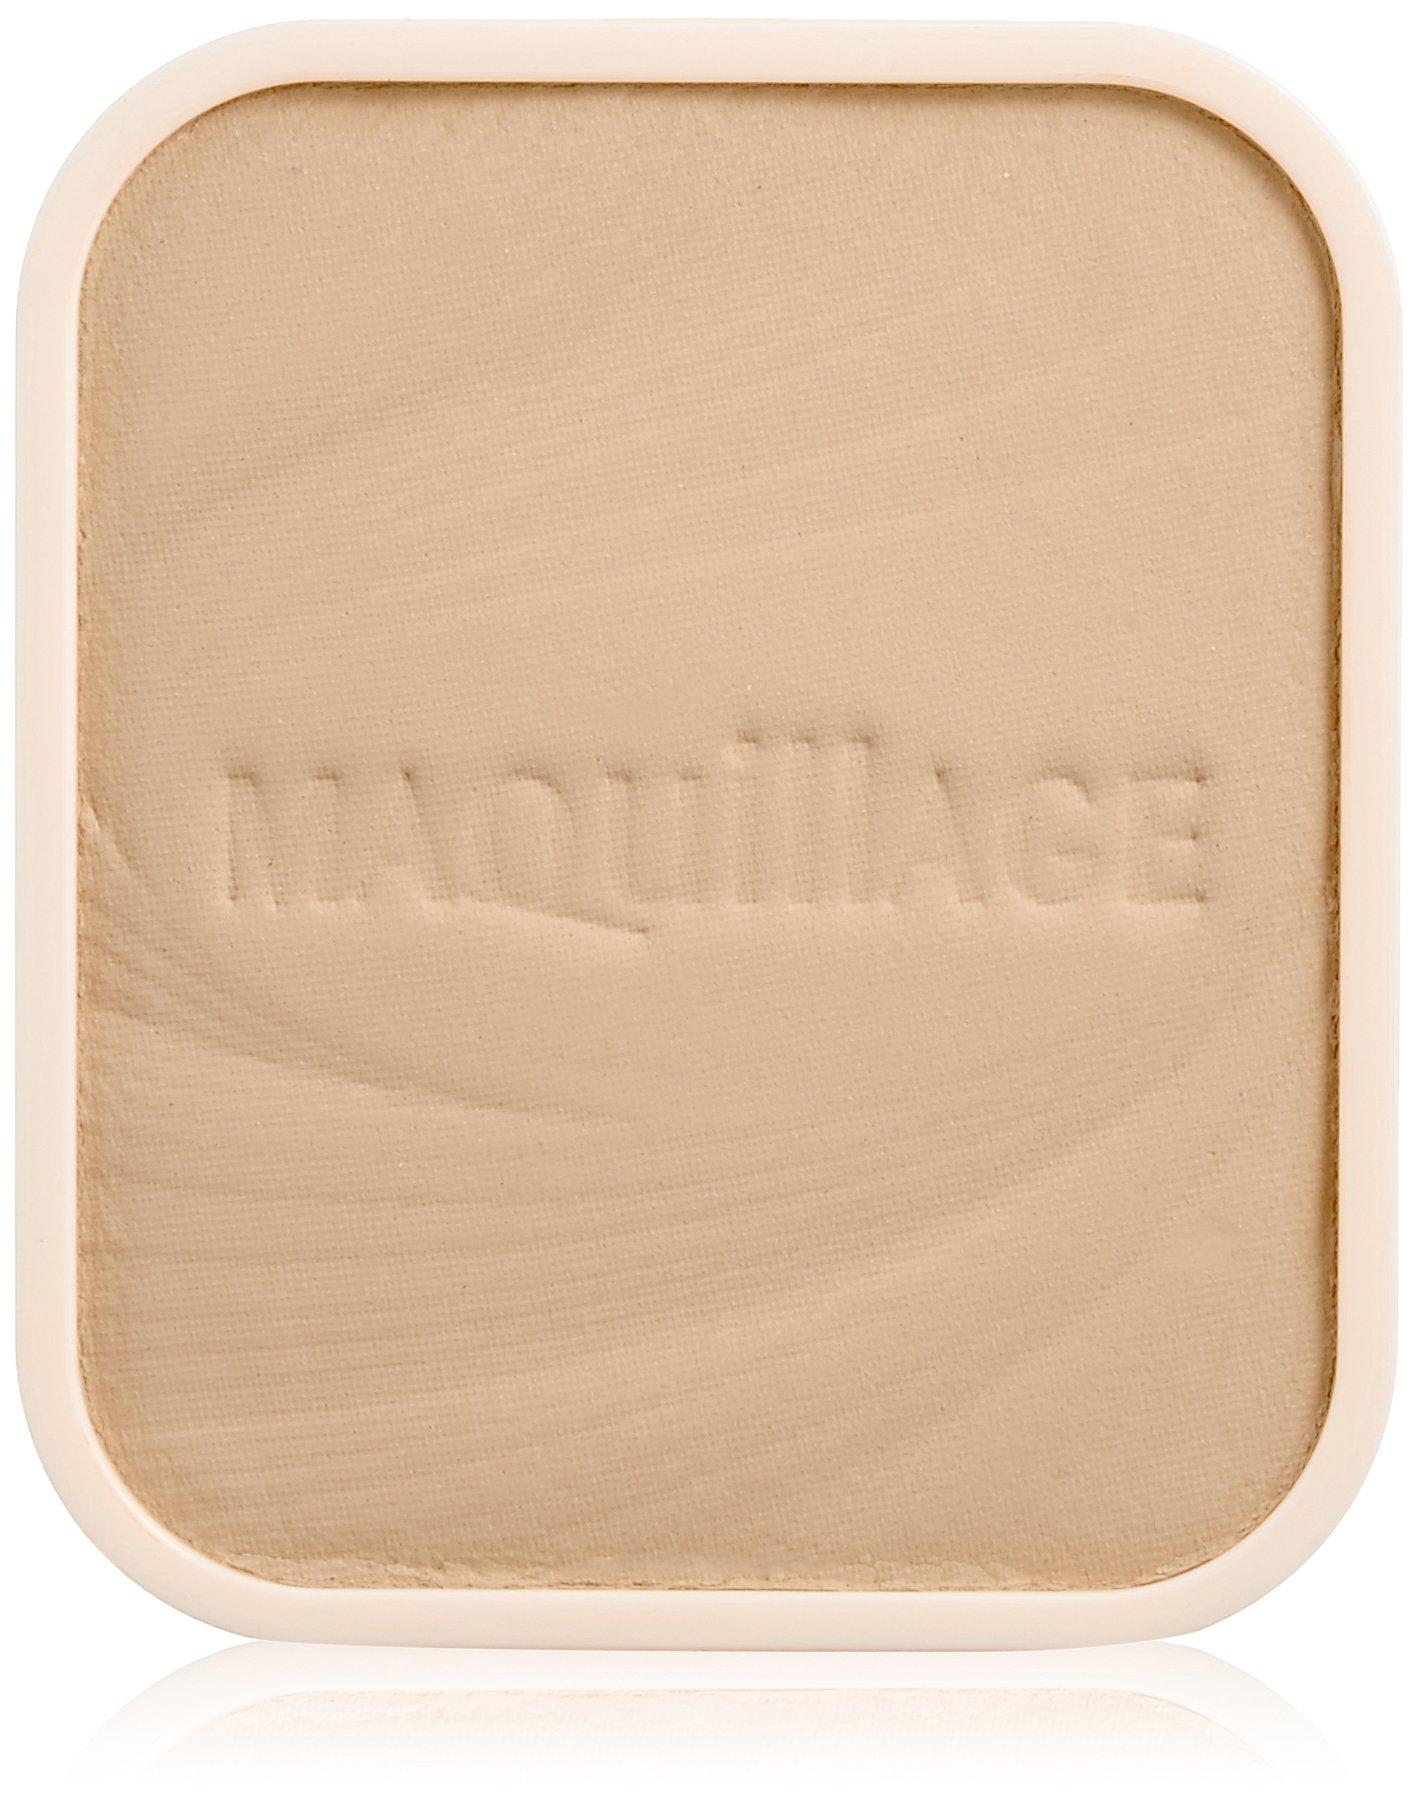 Shiseido MAQuillAGE Dramatic Powdery UV Foundation SPF25 PA++ Refill 9.2g/0.324oz #OC20